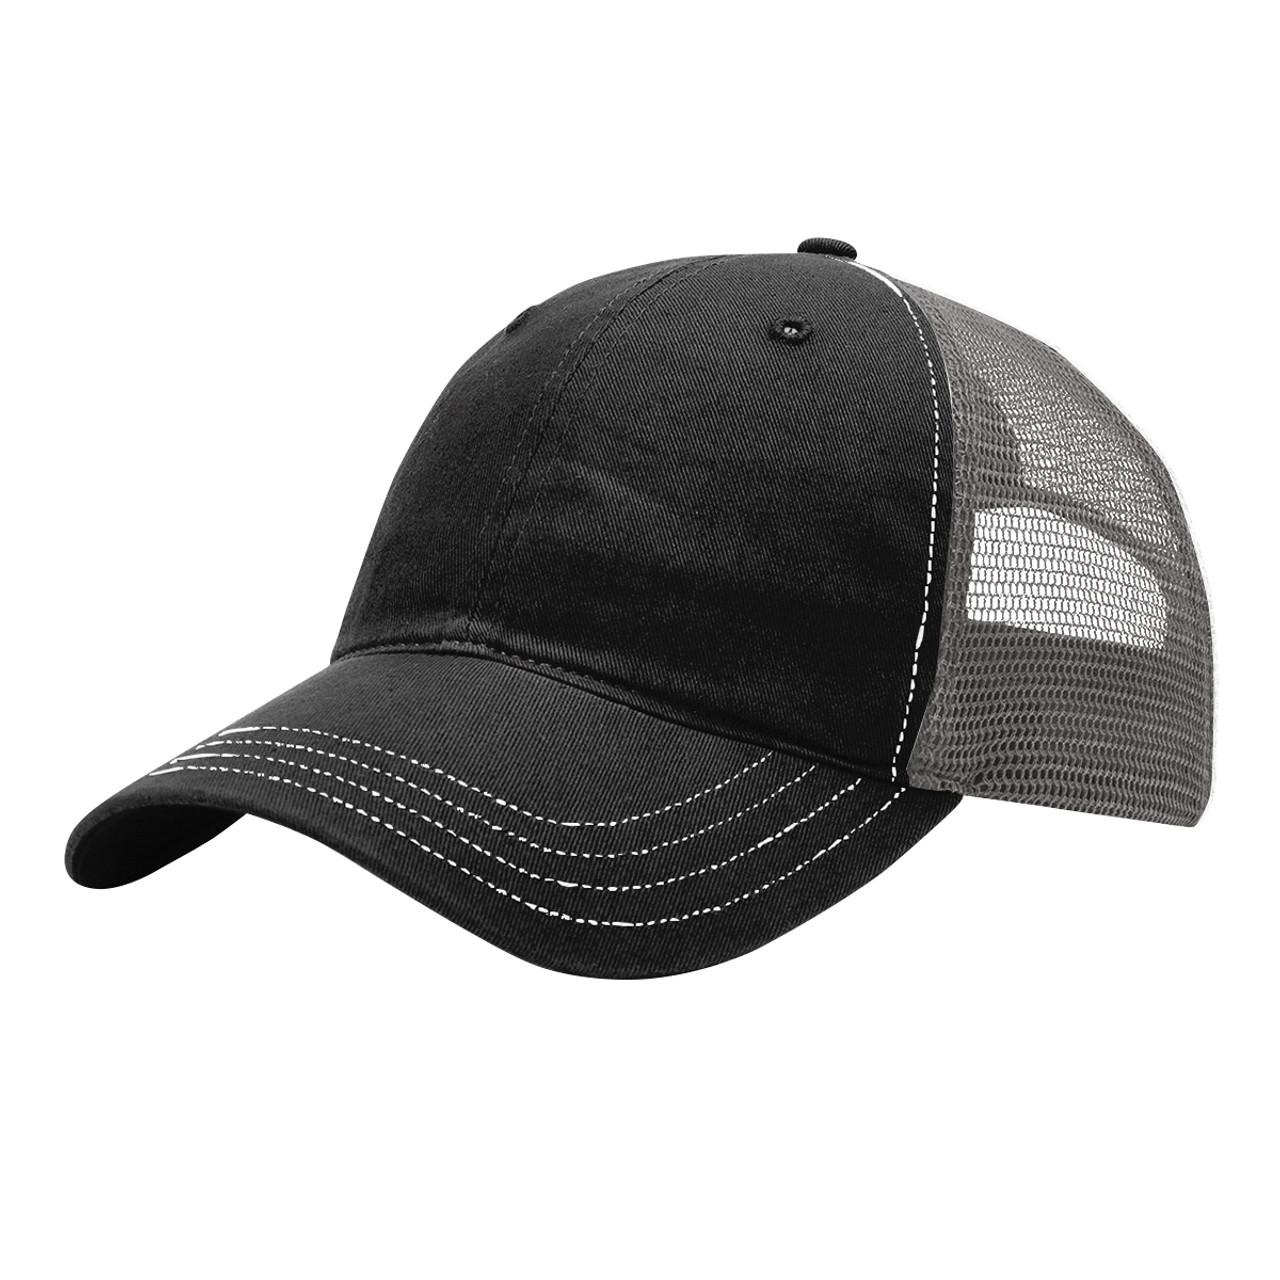 Black/Charcoal - 111 Richardson Washed Trucker Hat   T-shirt.ca